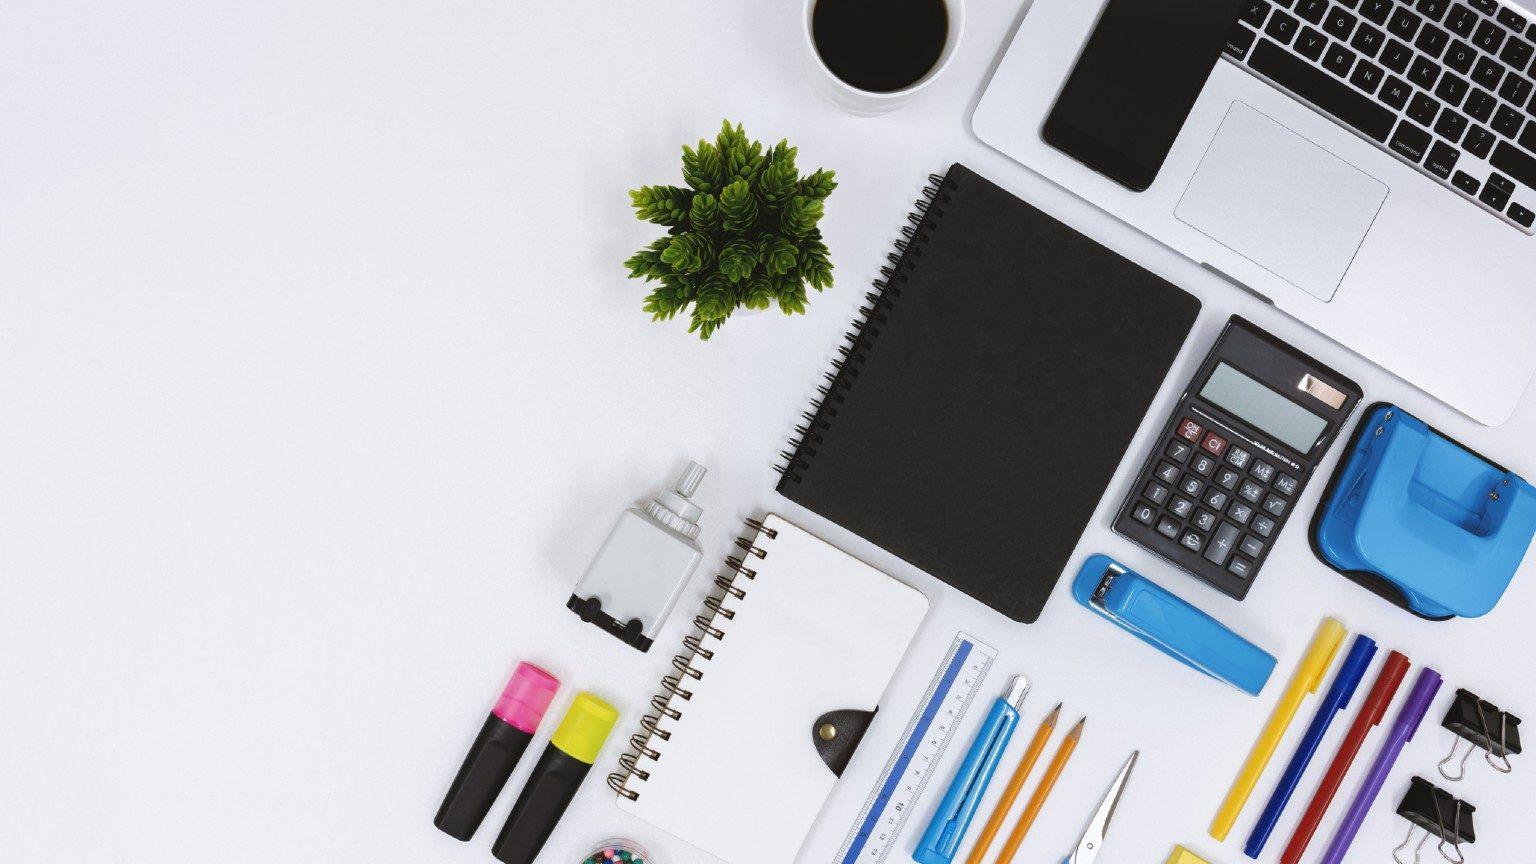 Office supplies in white desk